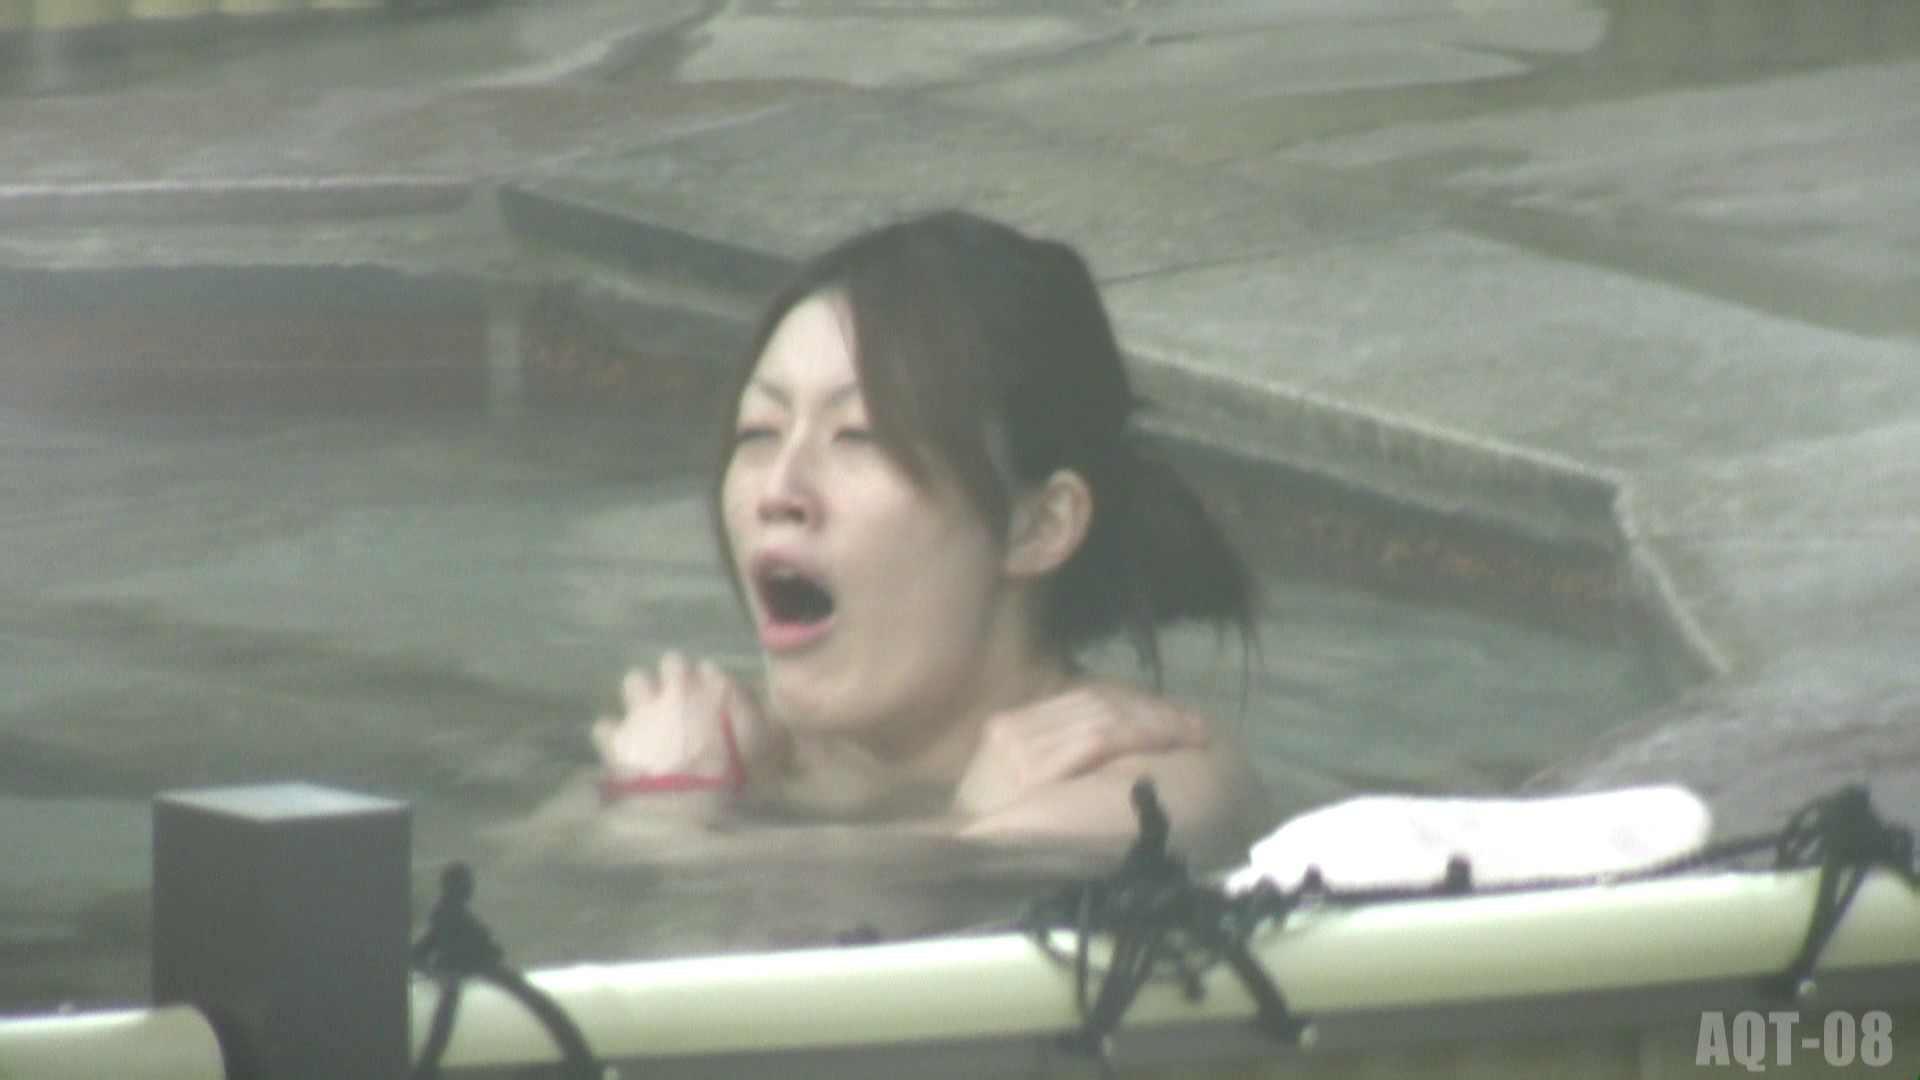 Aquaな露天風呂Vol.775 盗撮師作品 AV無料動画キャプチャ 98pic 29